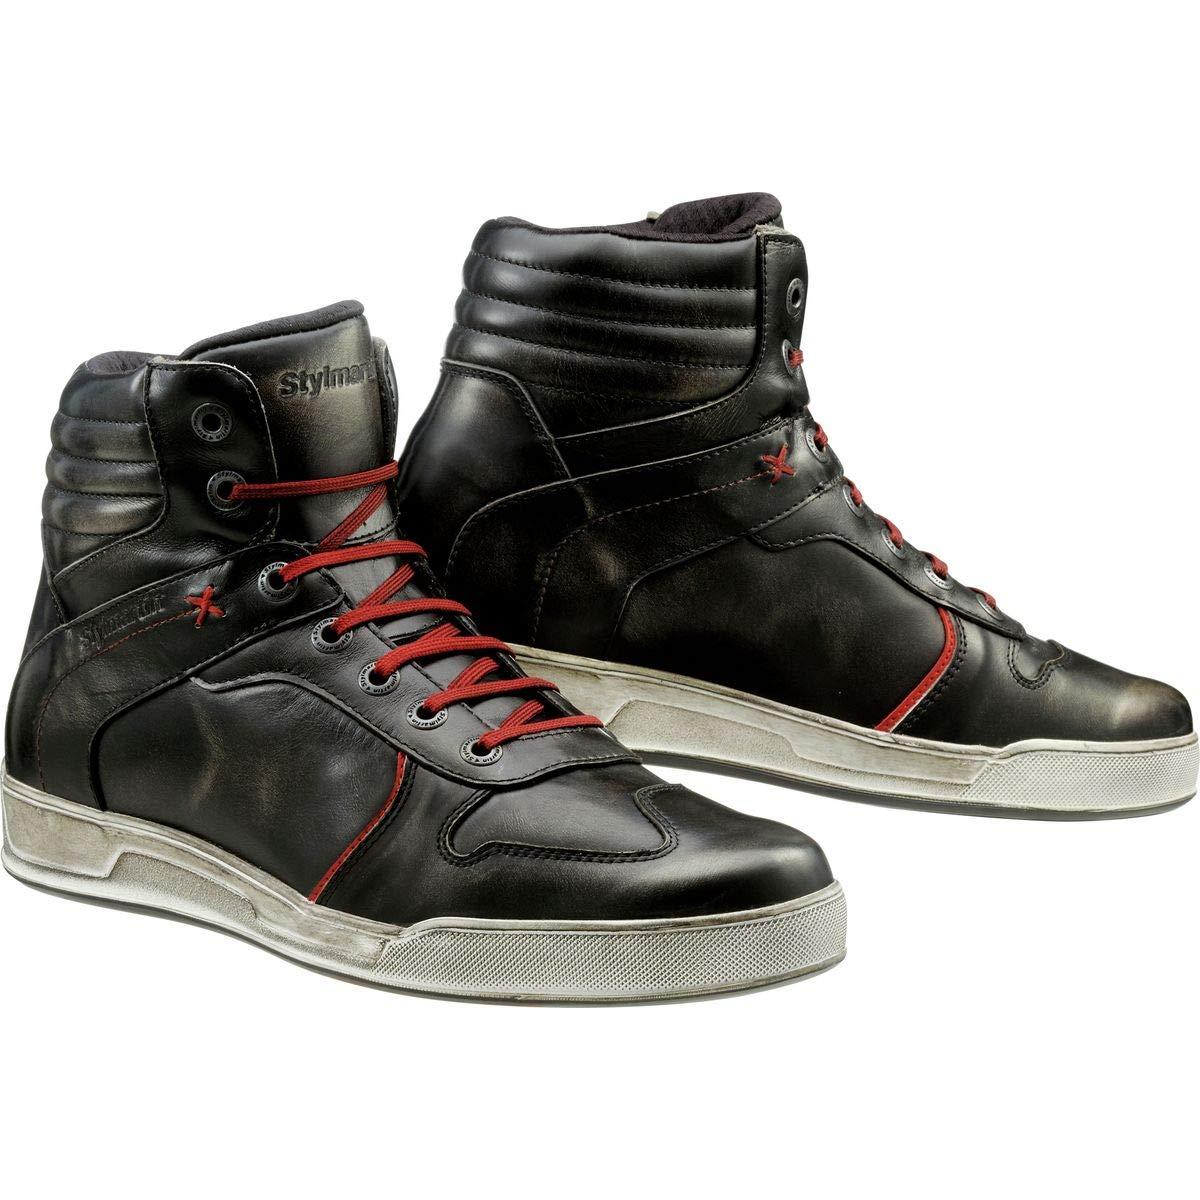 Stylmartin Adult Iron Urban Line Vintage Sneakers Black Size: US-13, EU-47